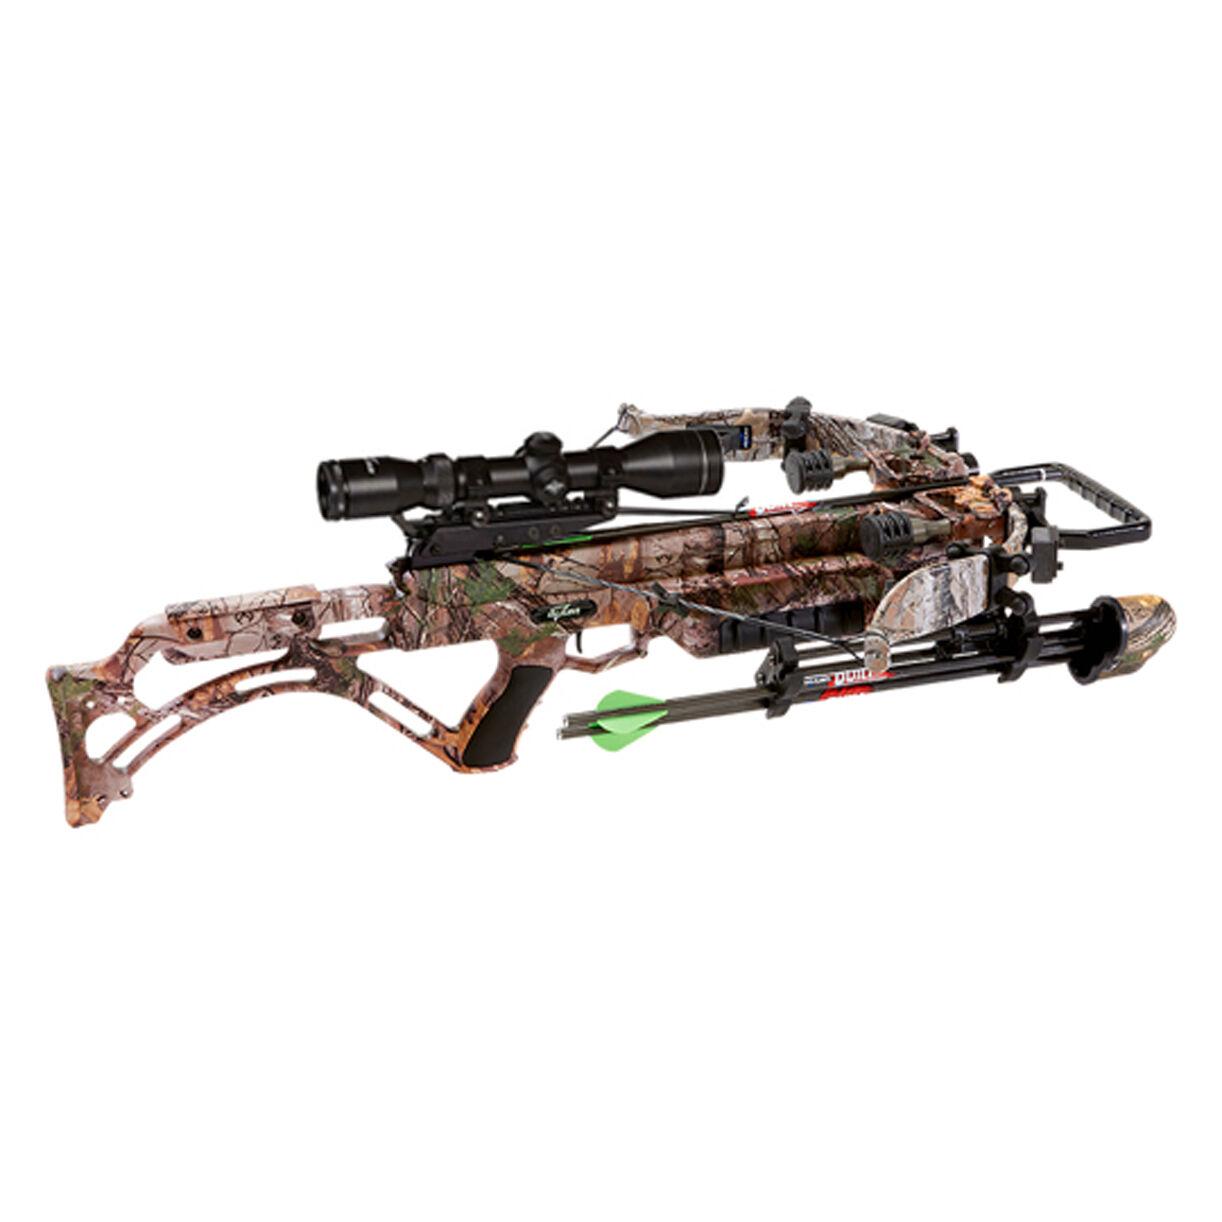 Excalibur Micro Suppressor Crossbow Package w/ TWILIGHT DLX